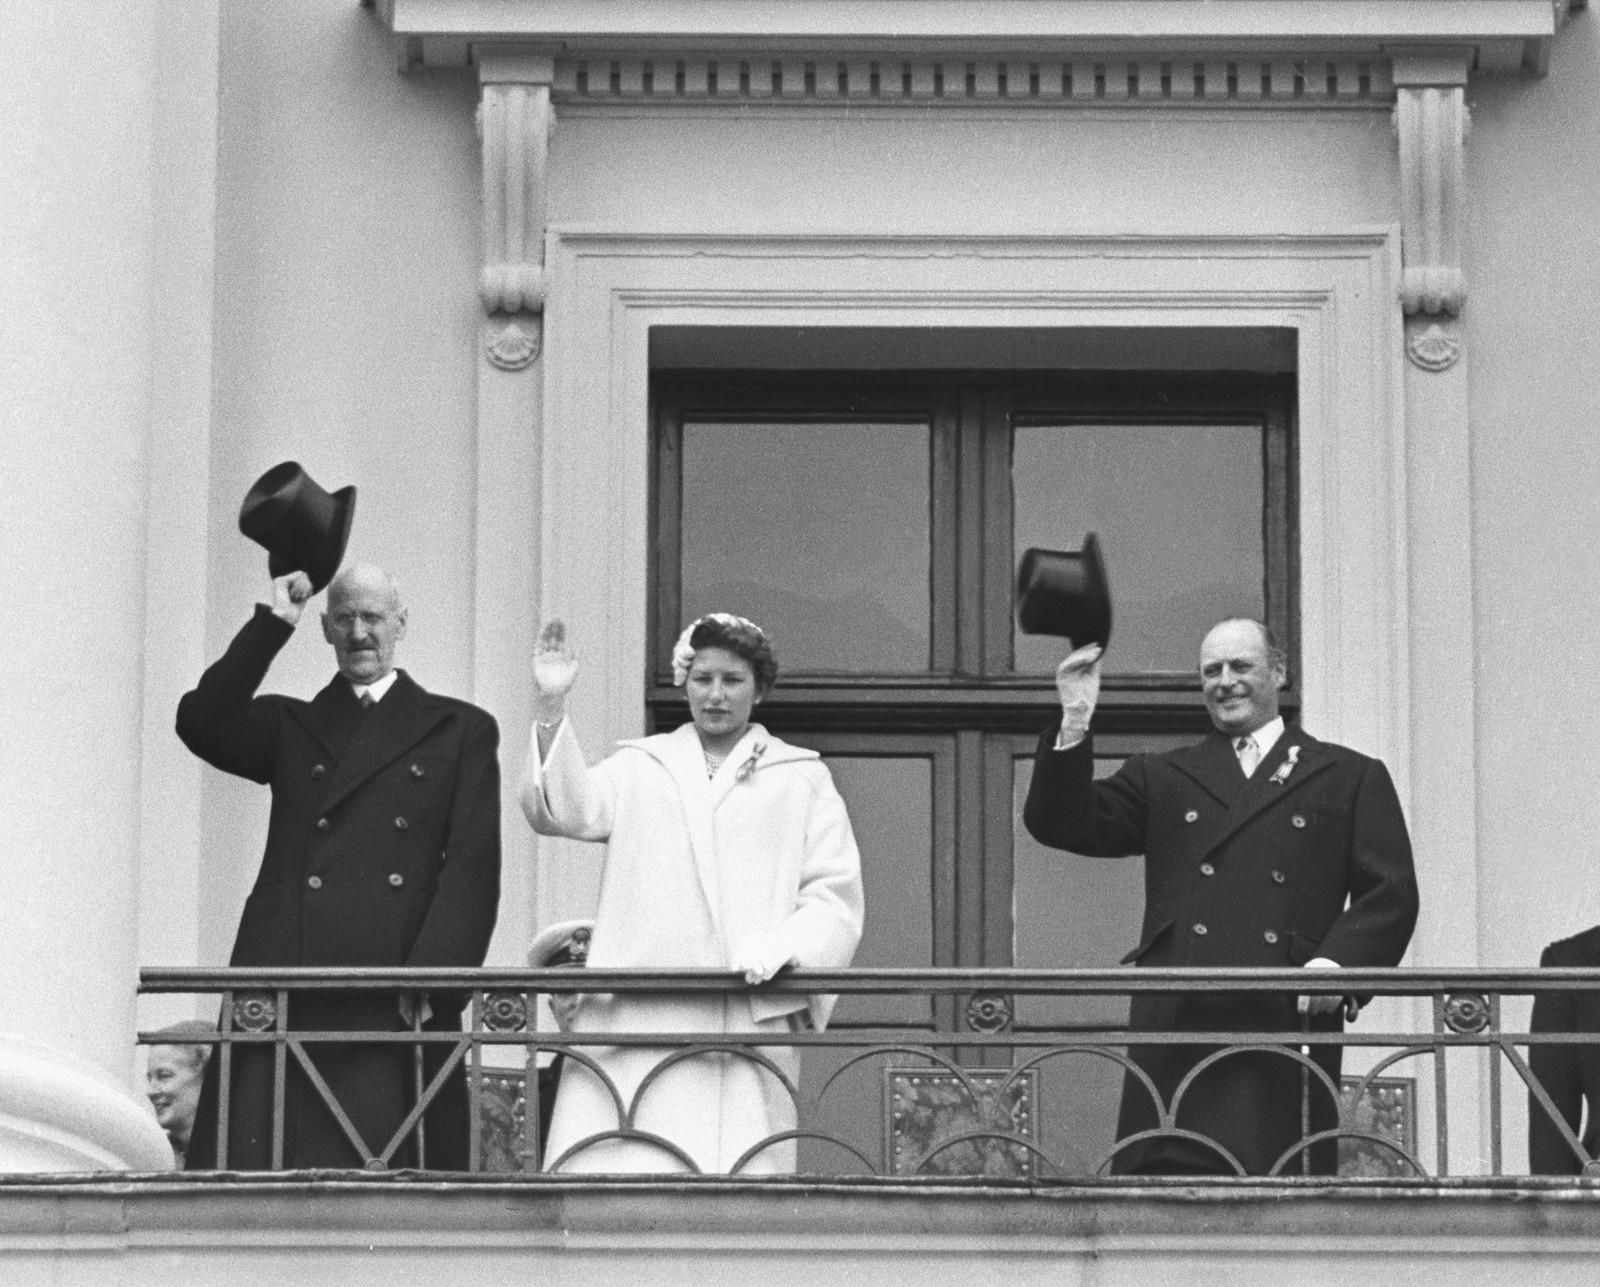 FØRSTEDAME: Alvor prega den unge førstedama på slottsbalkongen i 1955. Saman med ein aldrande kong Haakon VII og ein sørgande kronprins Olav.